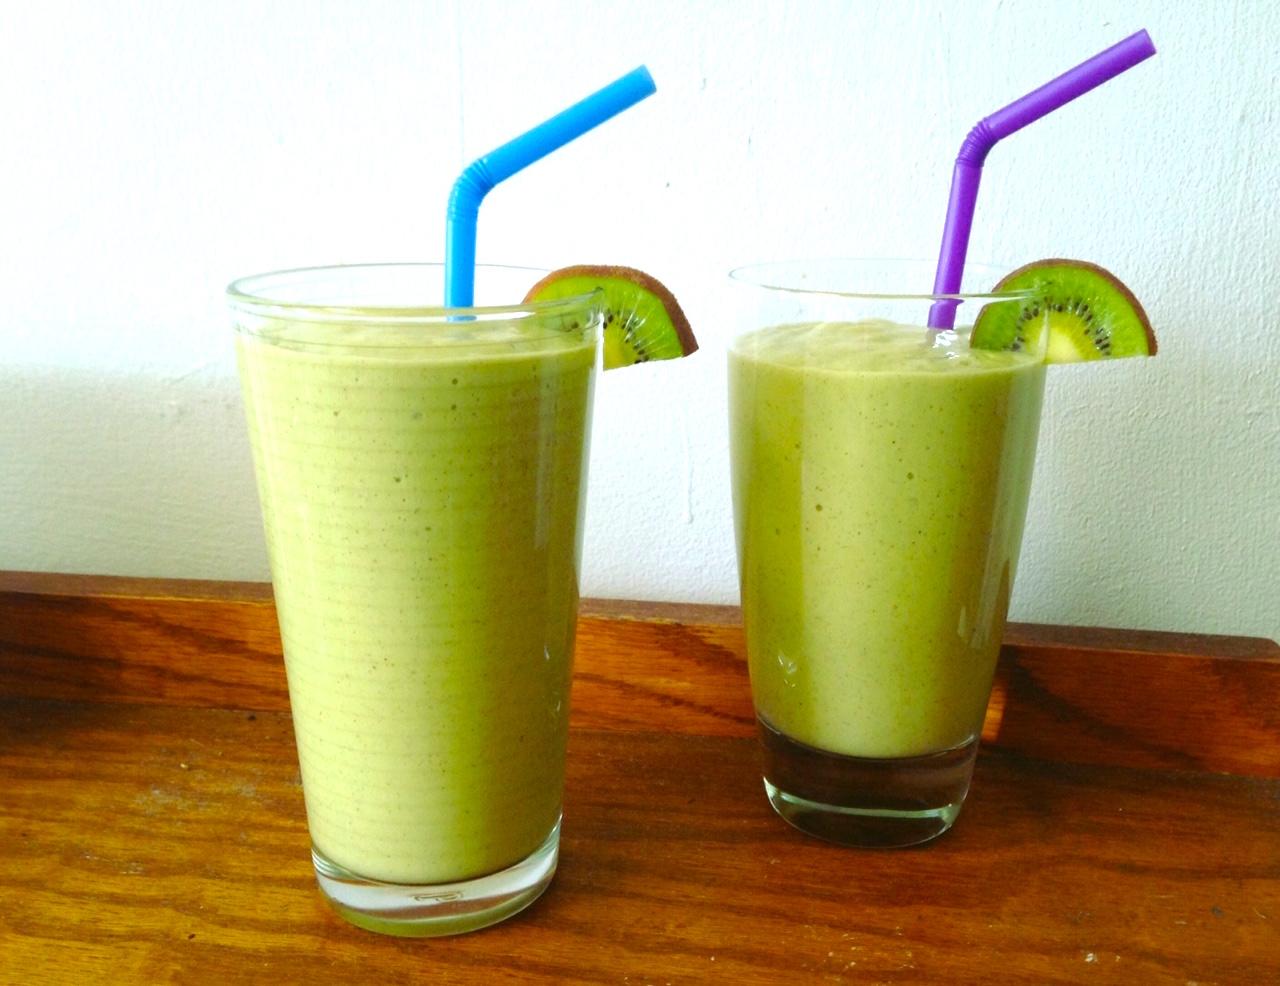 image-1.jpgMango, Kiwi, & Avocado Smoothie Green Smoothie —Vegan — Best Vibes Ever